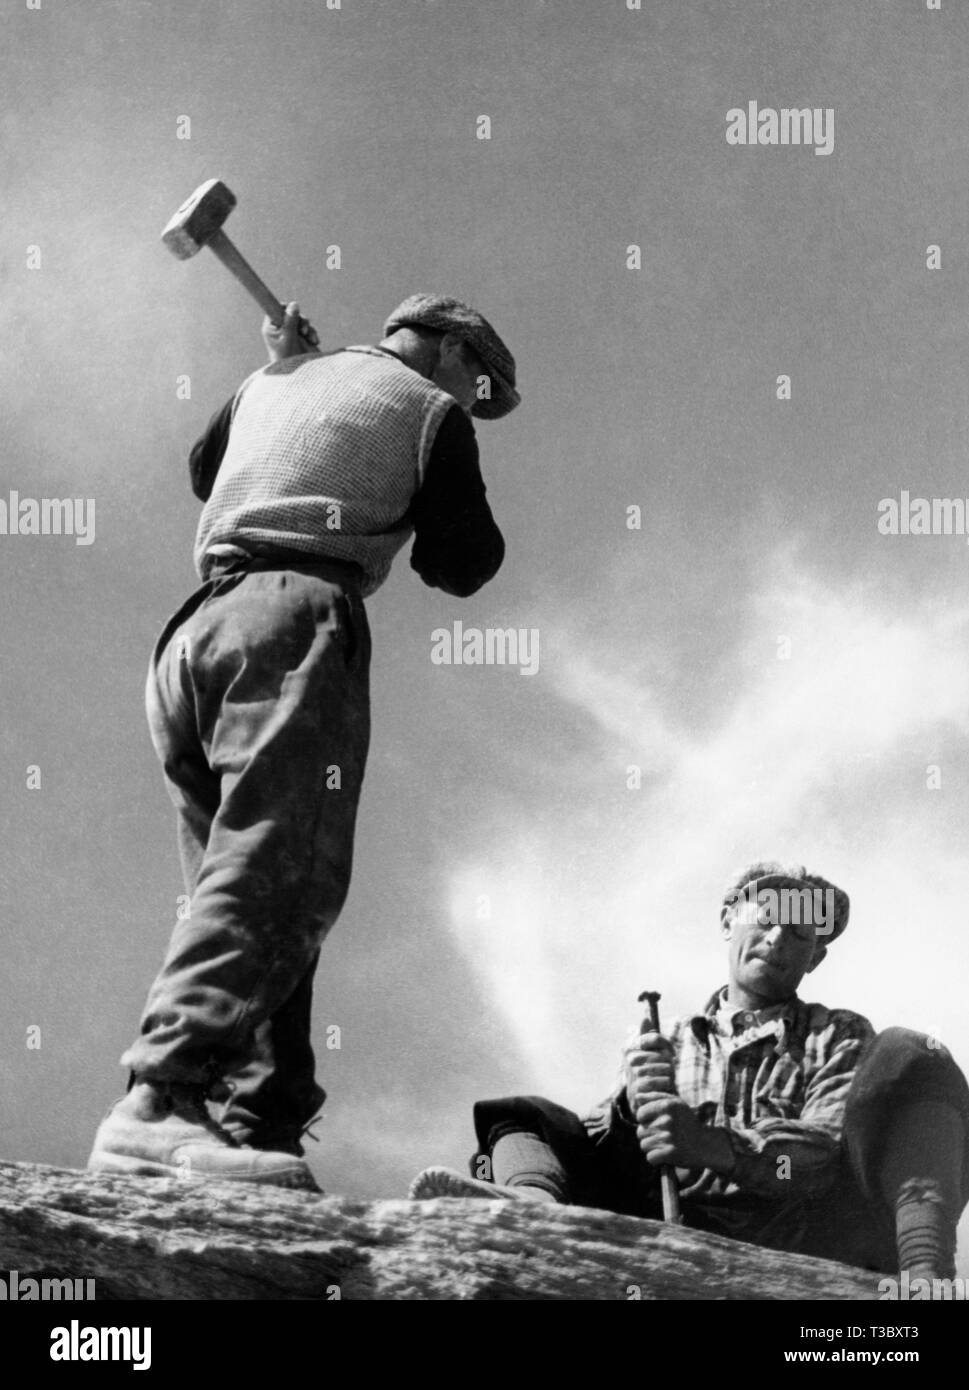 quarrymen, 1955 - Stock Image